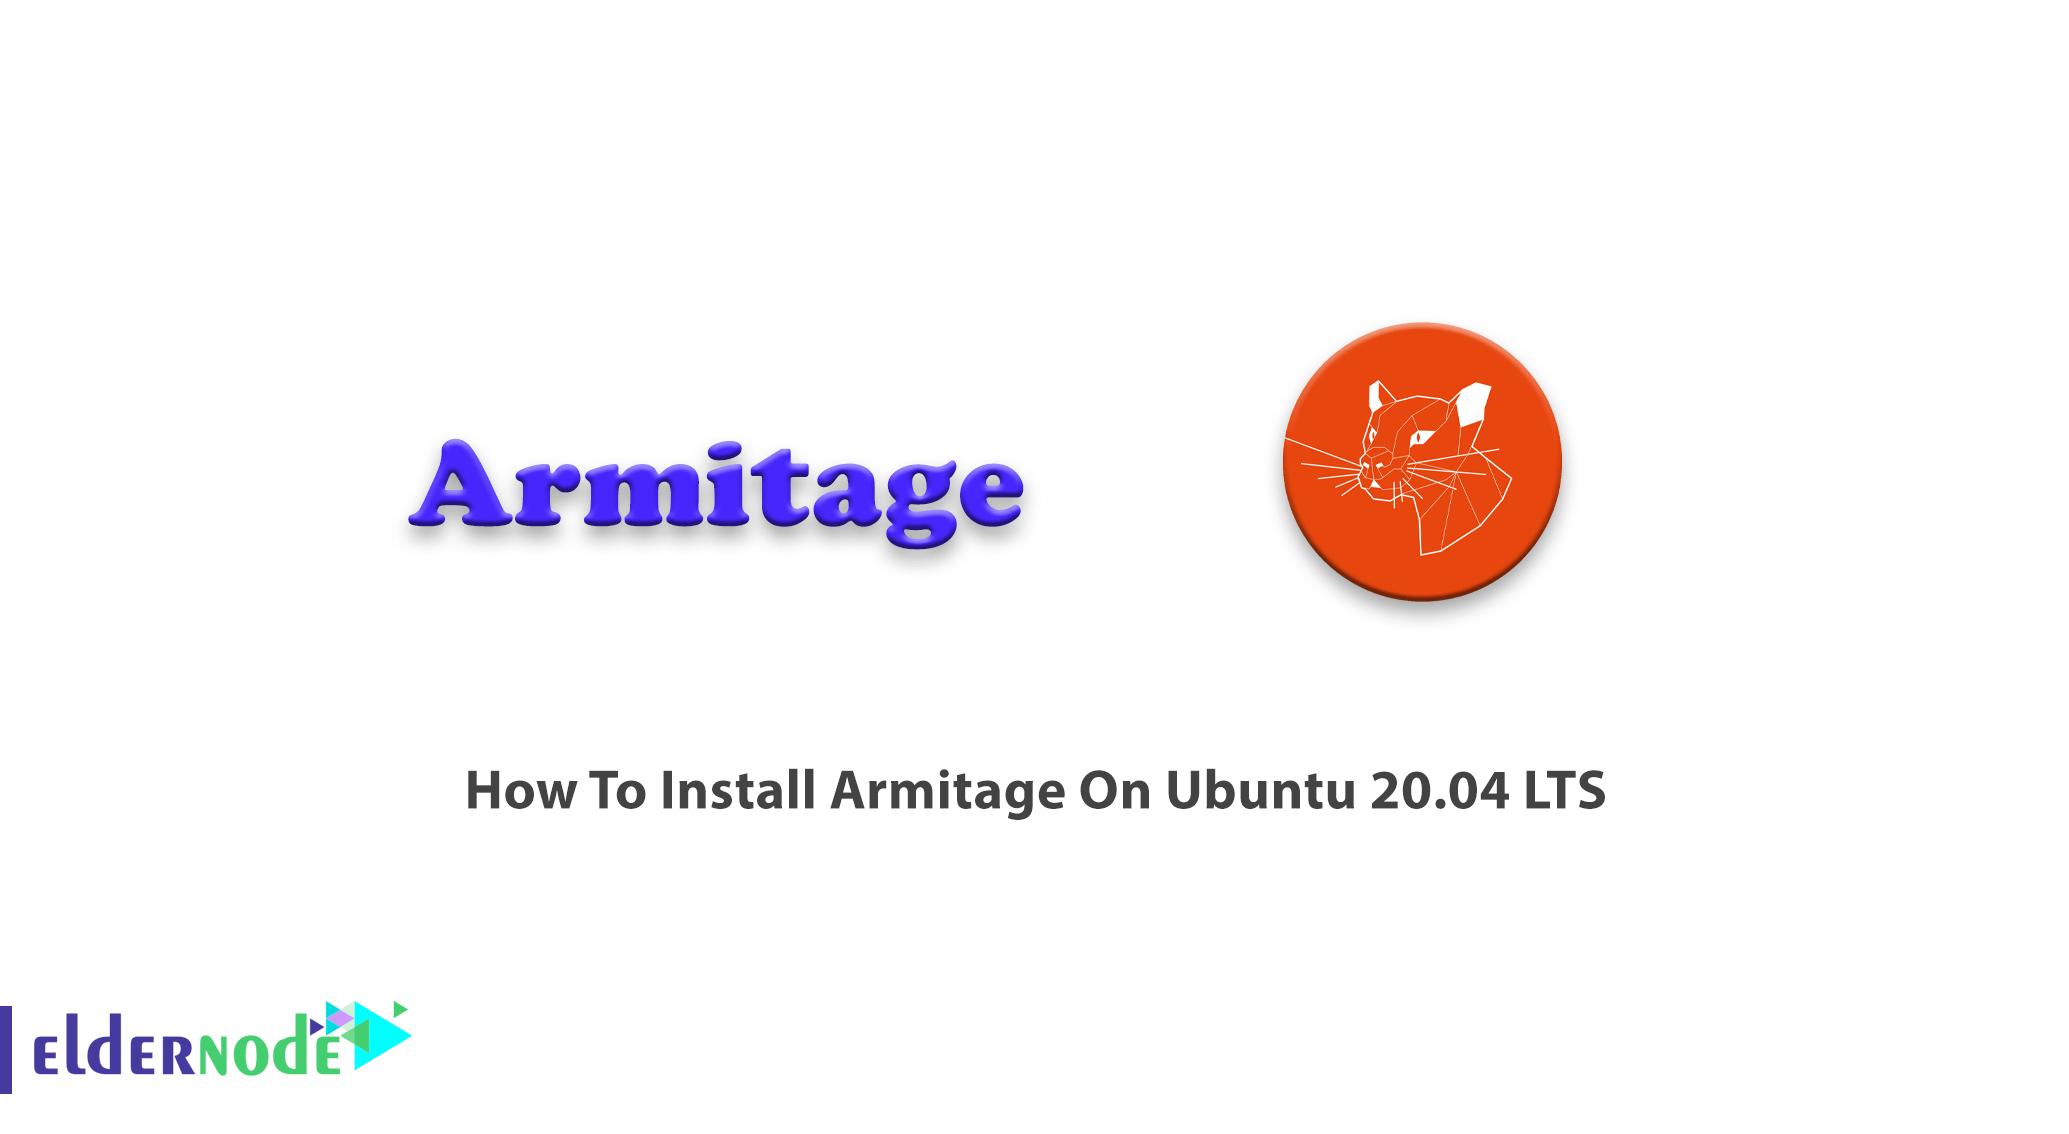 How To Install Armitage On Ubuntu 20.04 LTS